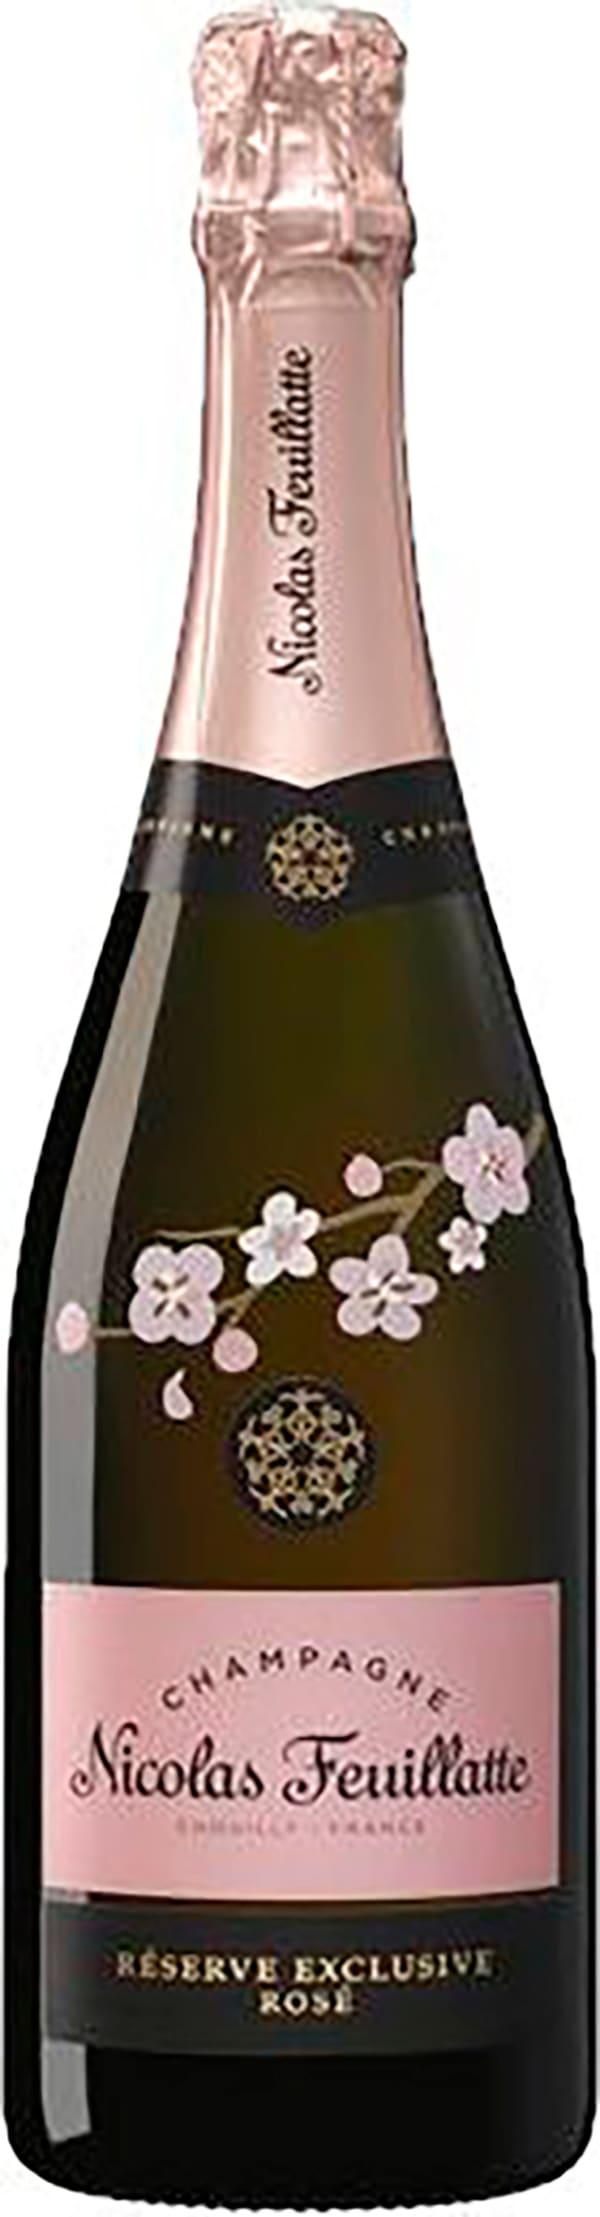 Nicolas Feuillatte Rosé Champagne Brut lahjapakkaus